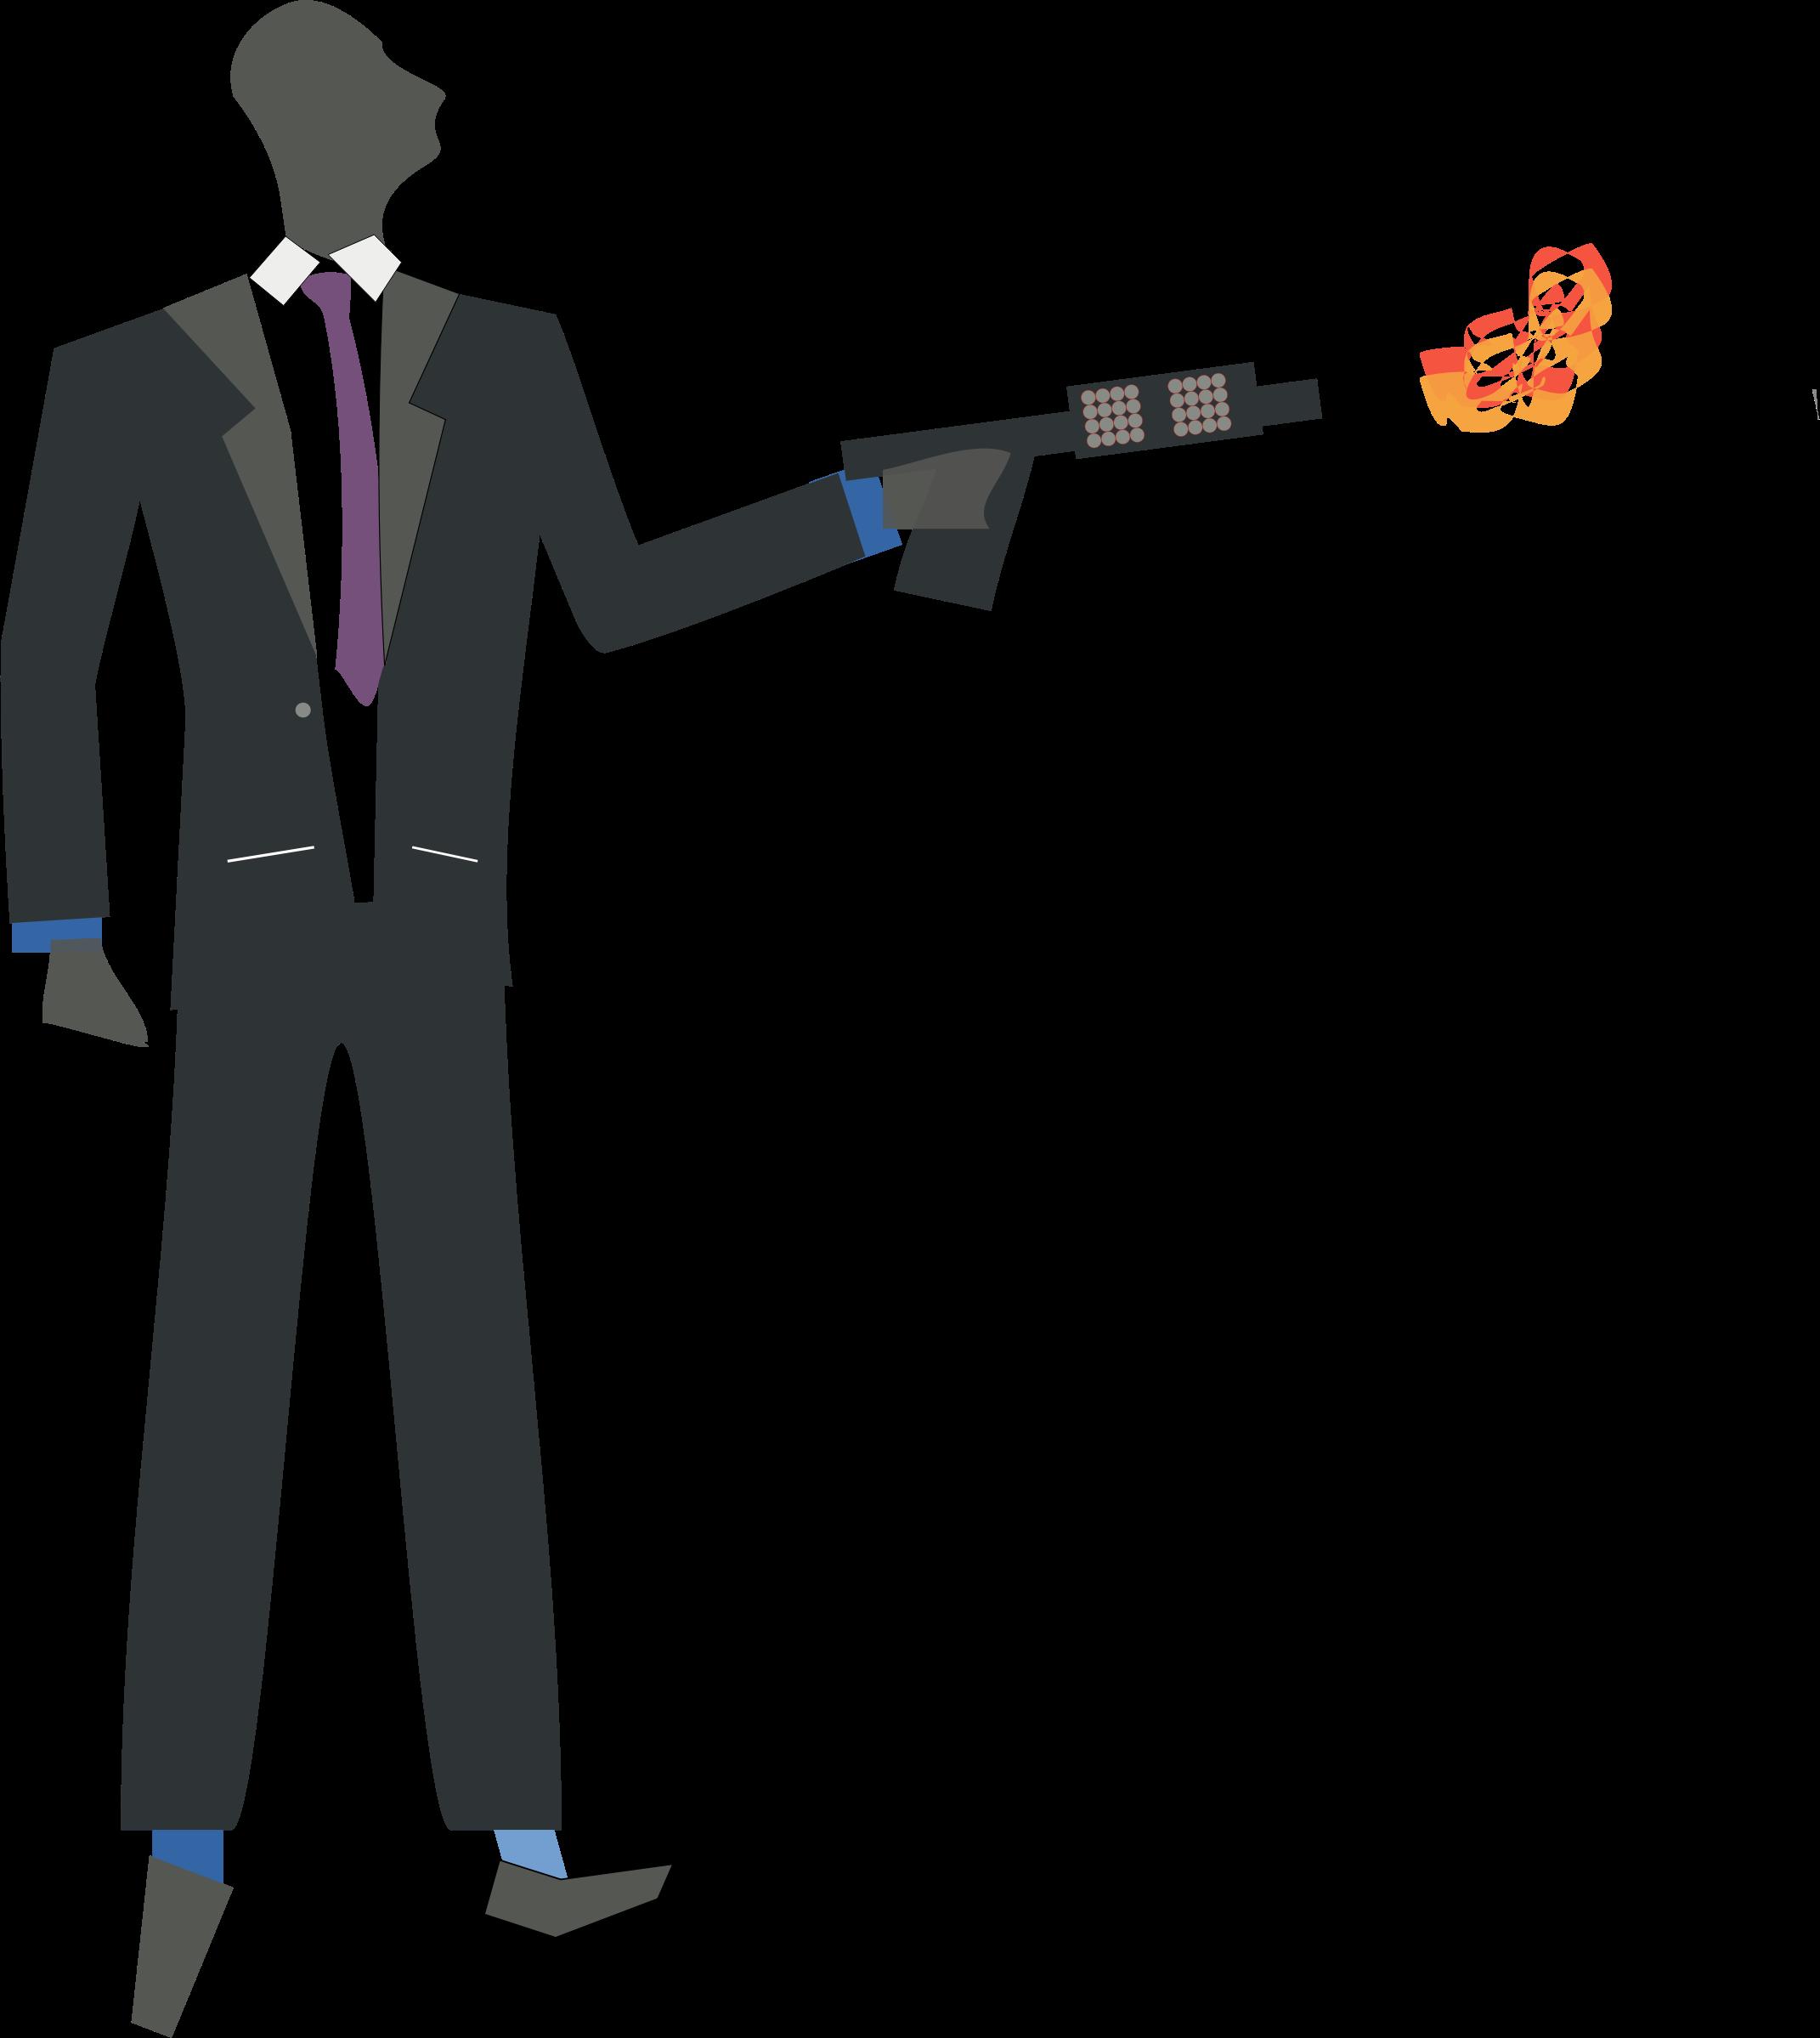 Flamethrower Clipart.